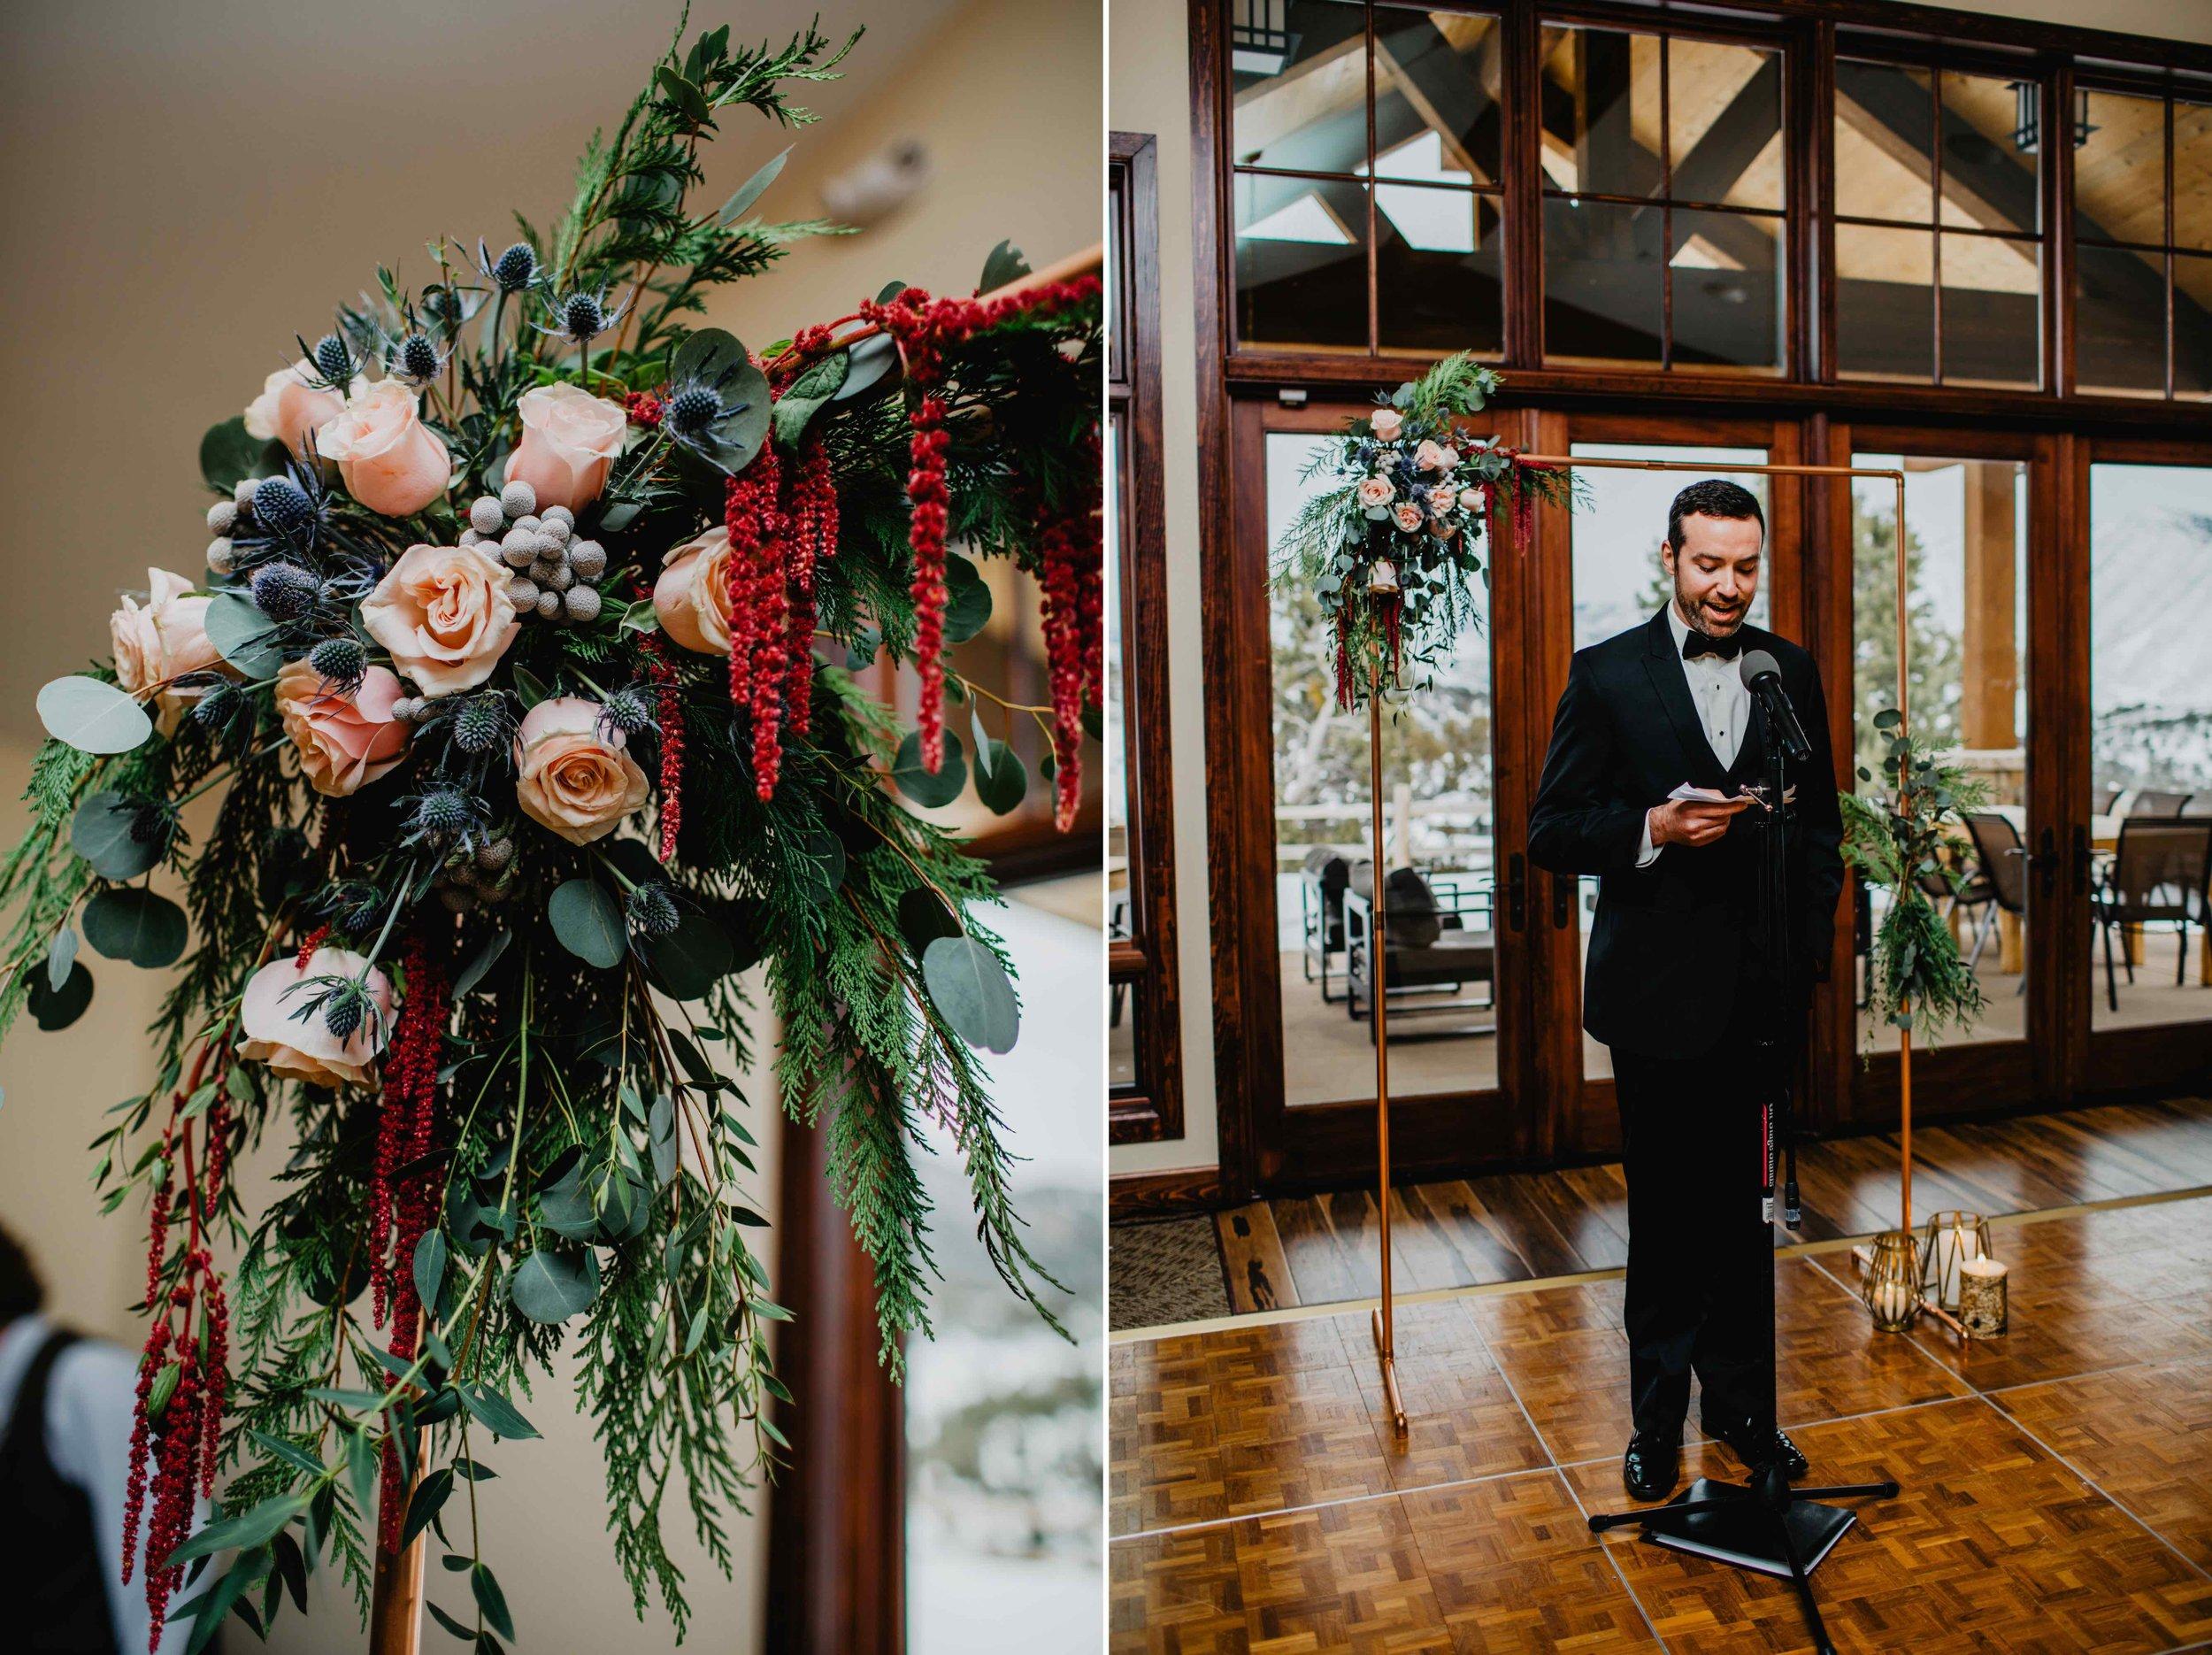 Kisa Conrad Favorites-0001-colorado-wedding-photographer-denver-springs-vailhotel-glenwood-springs-colorado-wedding-photographer.jpeg